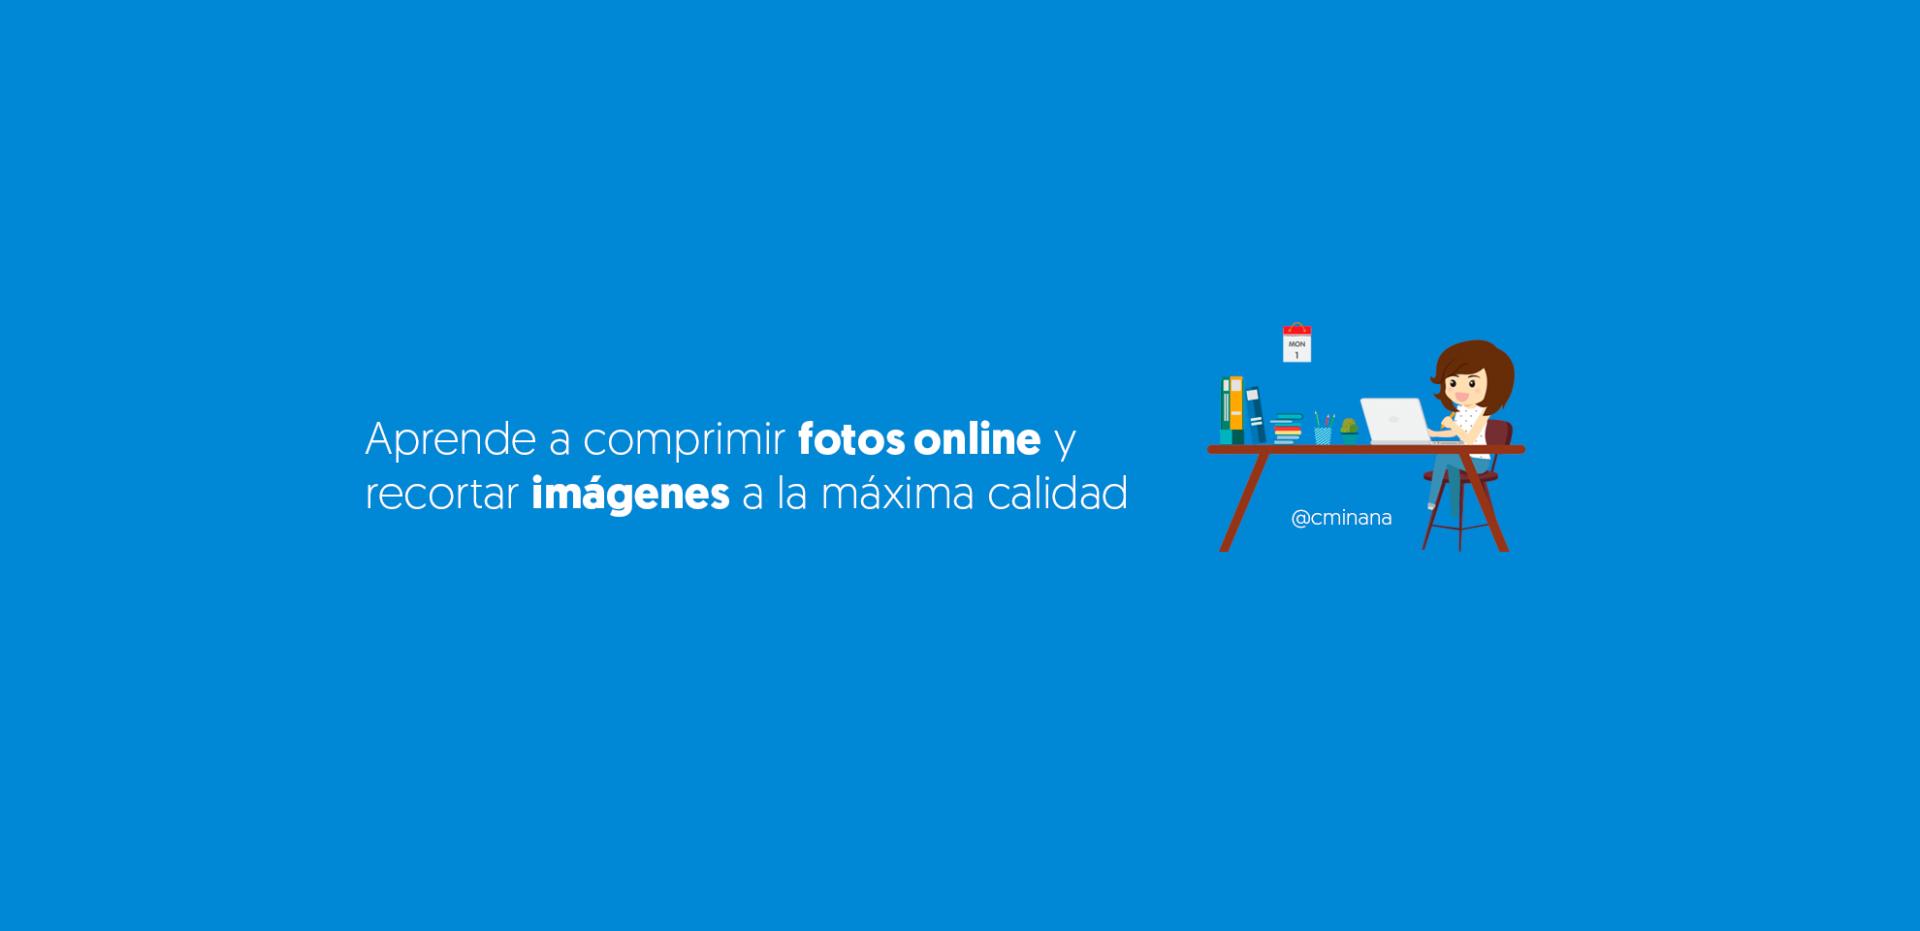 Programas para recortar fotos online 29